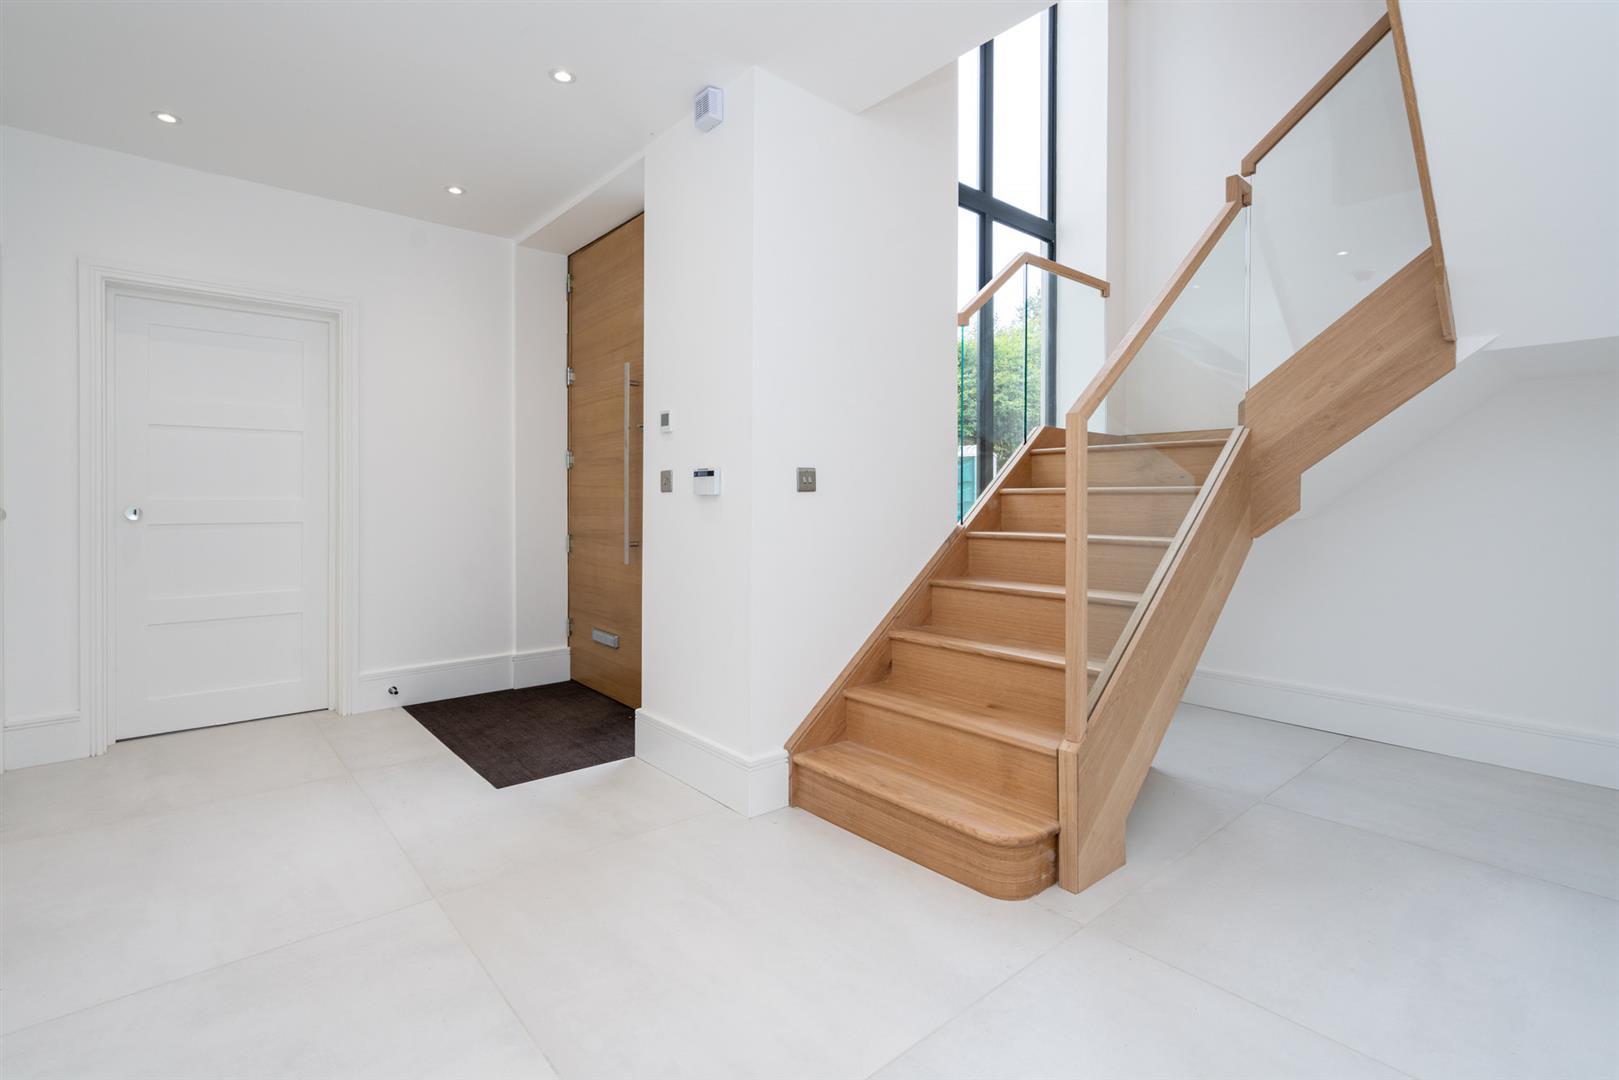 Bramley-3250 - stair case dwnstairs.jpg